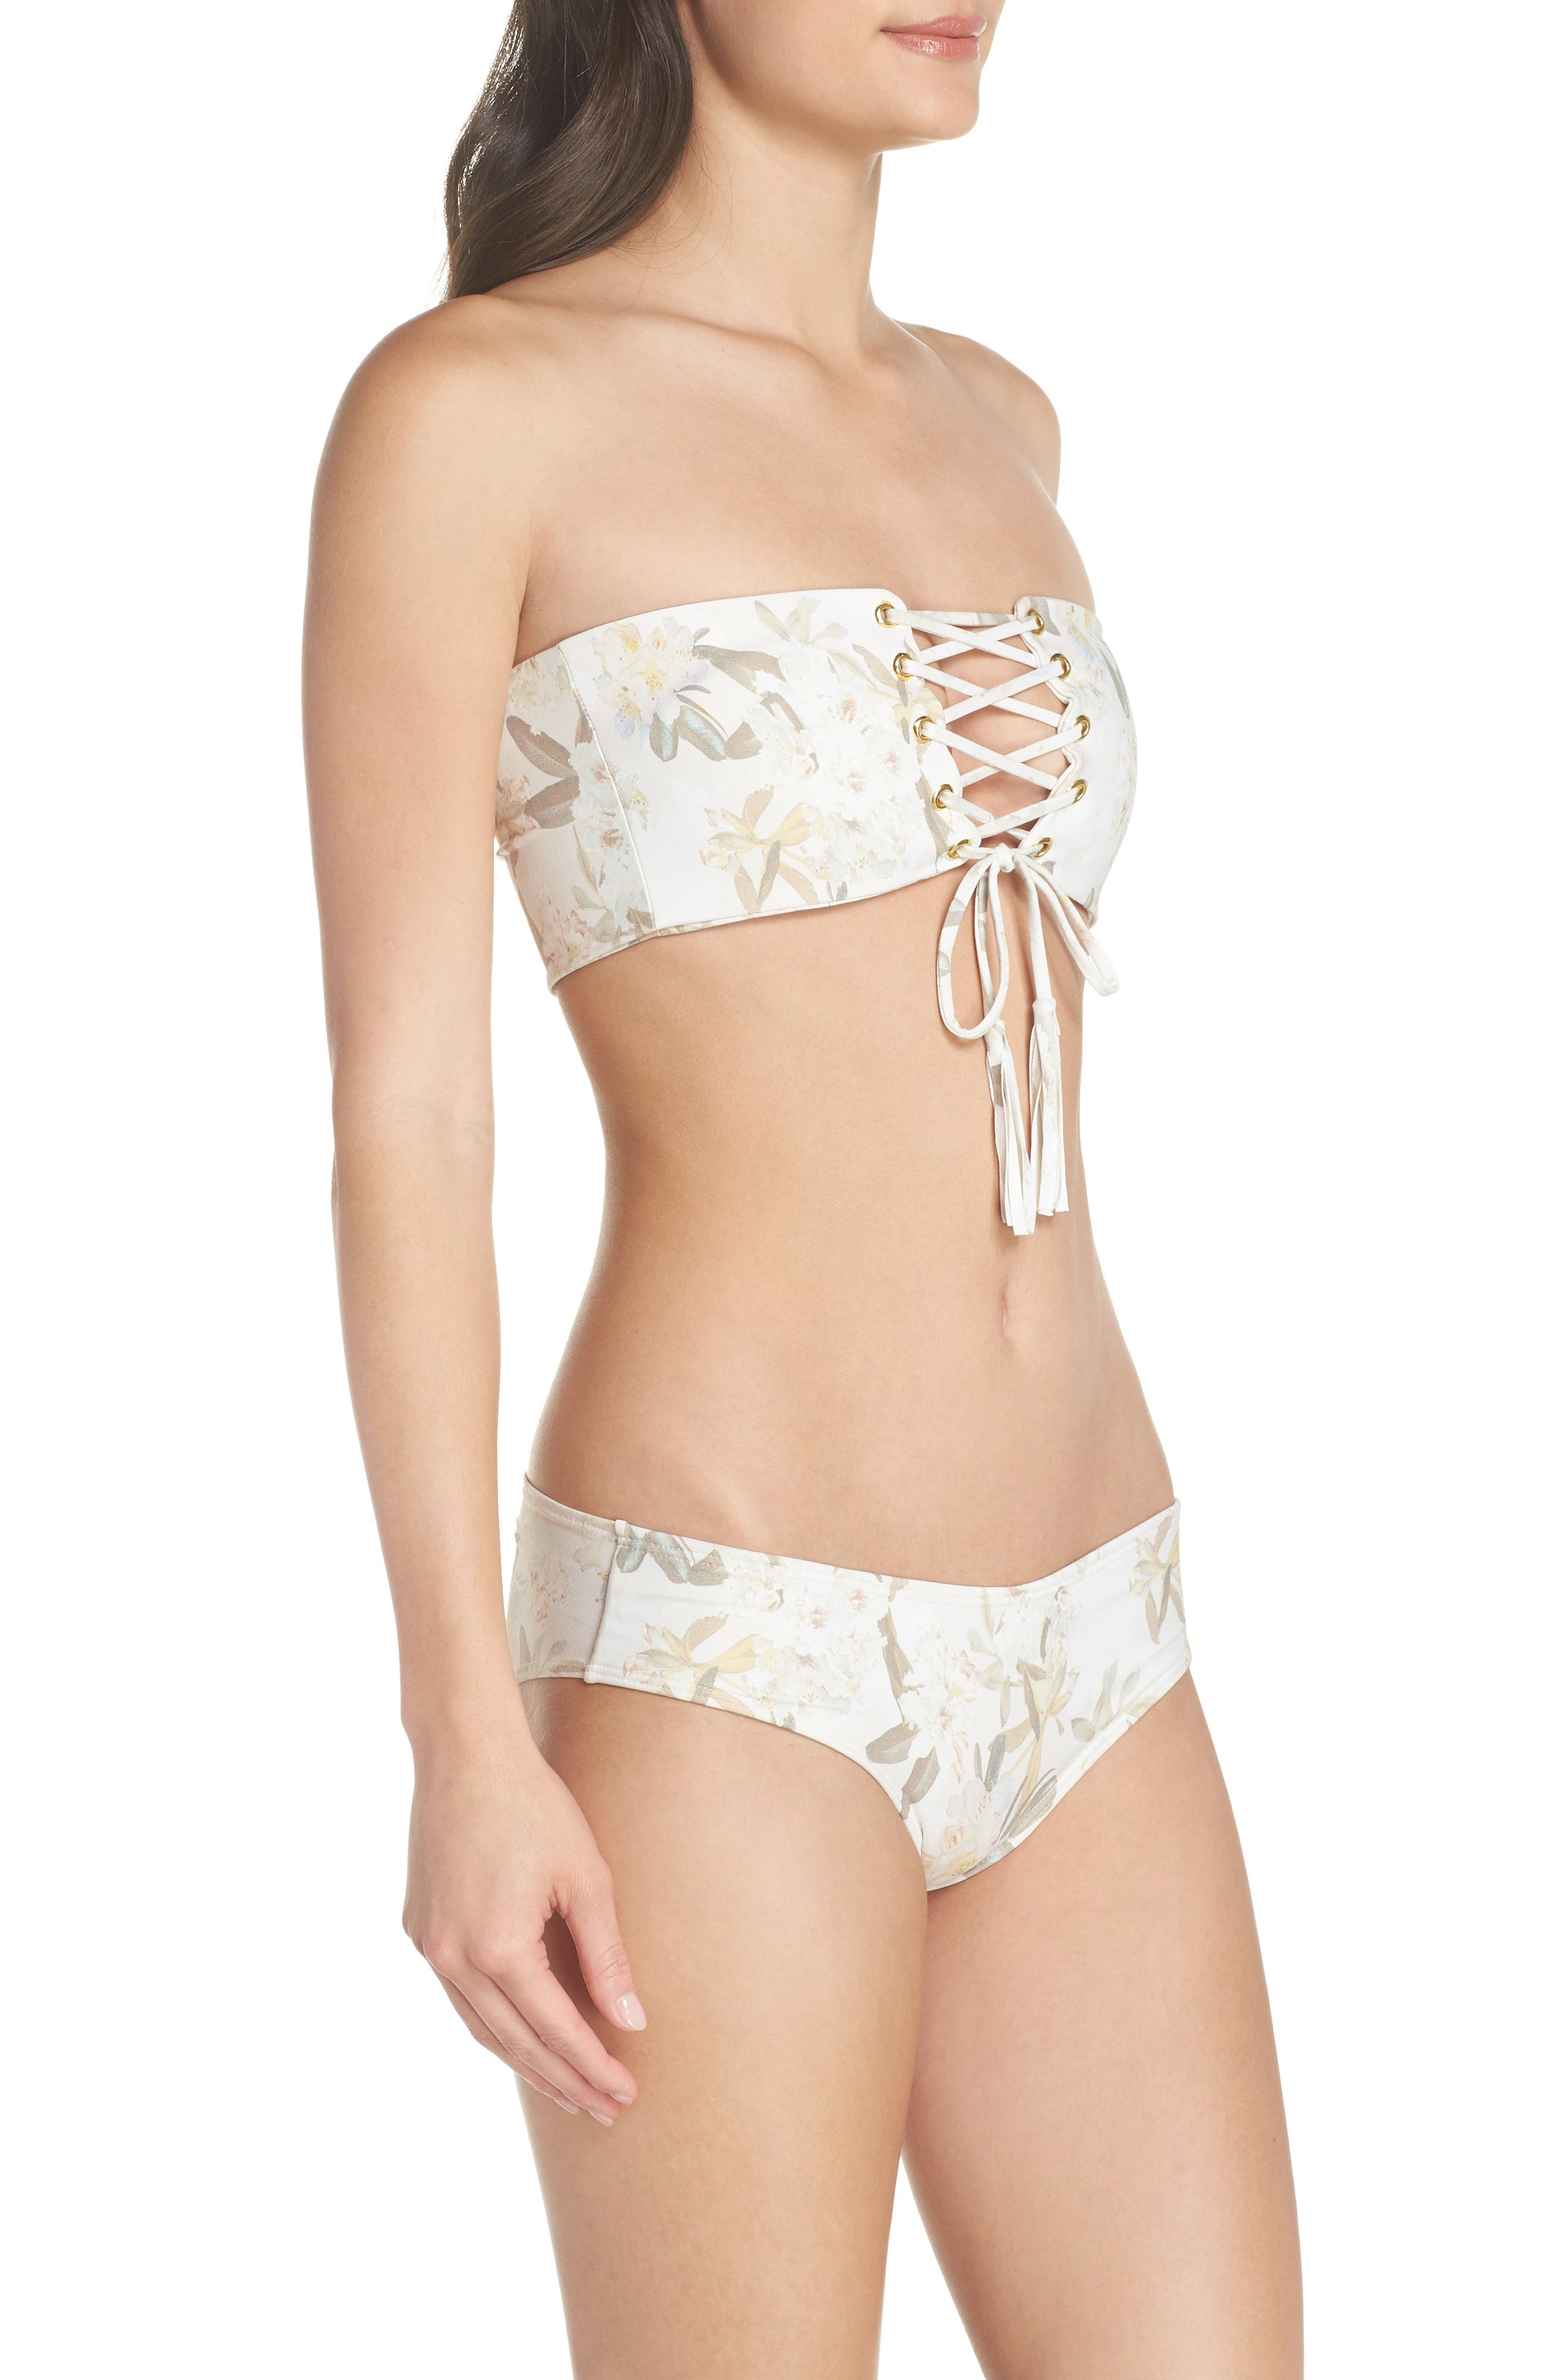 AC Nu Micro Bikini Bottoms,                             Alternate thumbnail 7, color,                             Ete Floral White